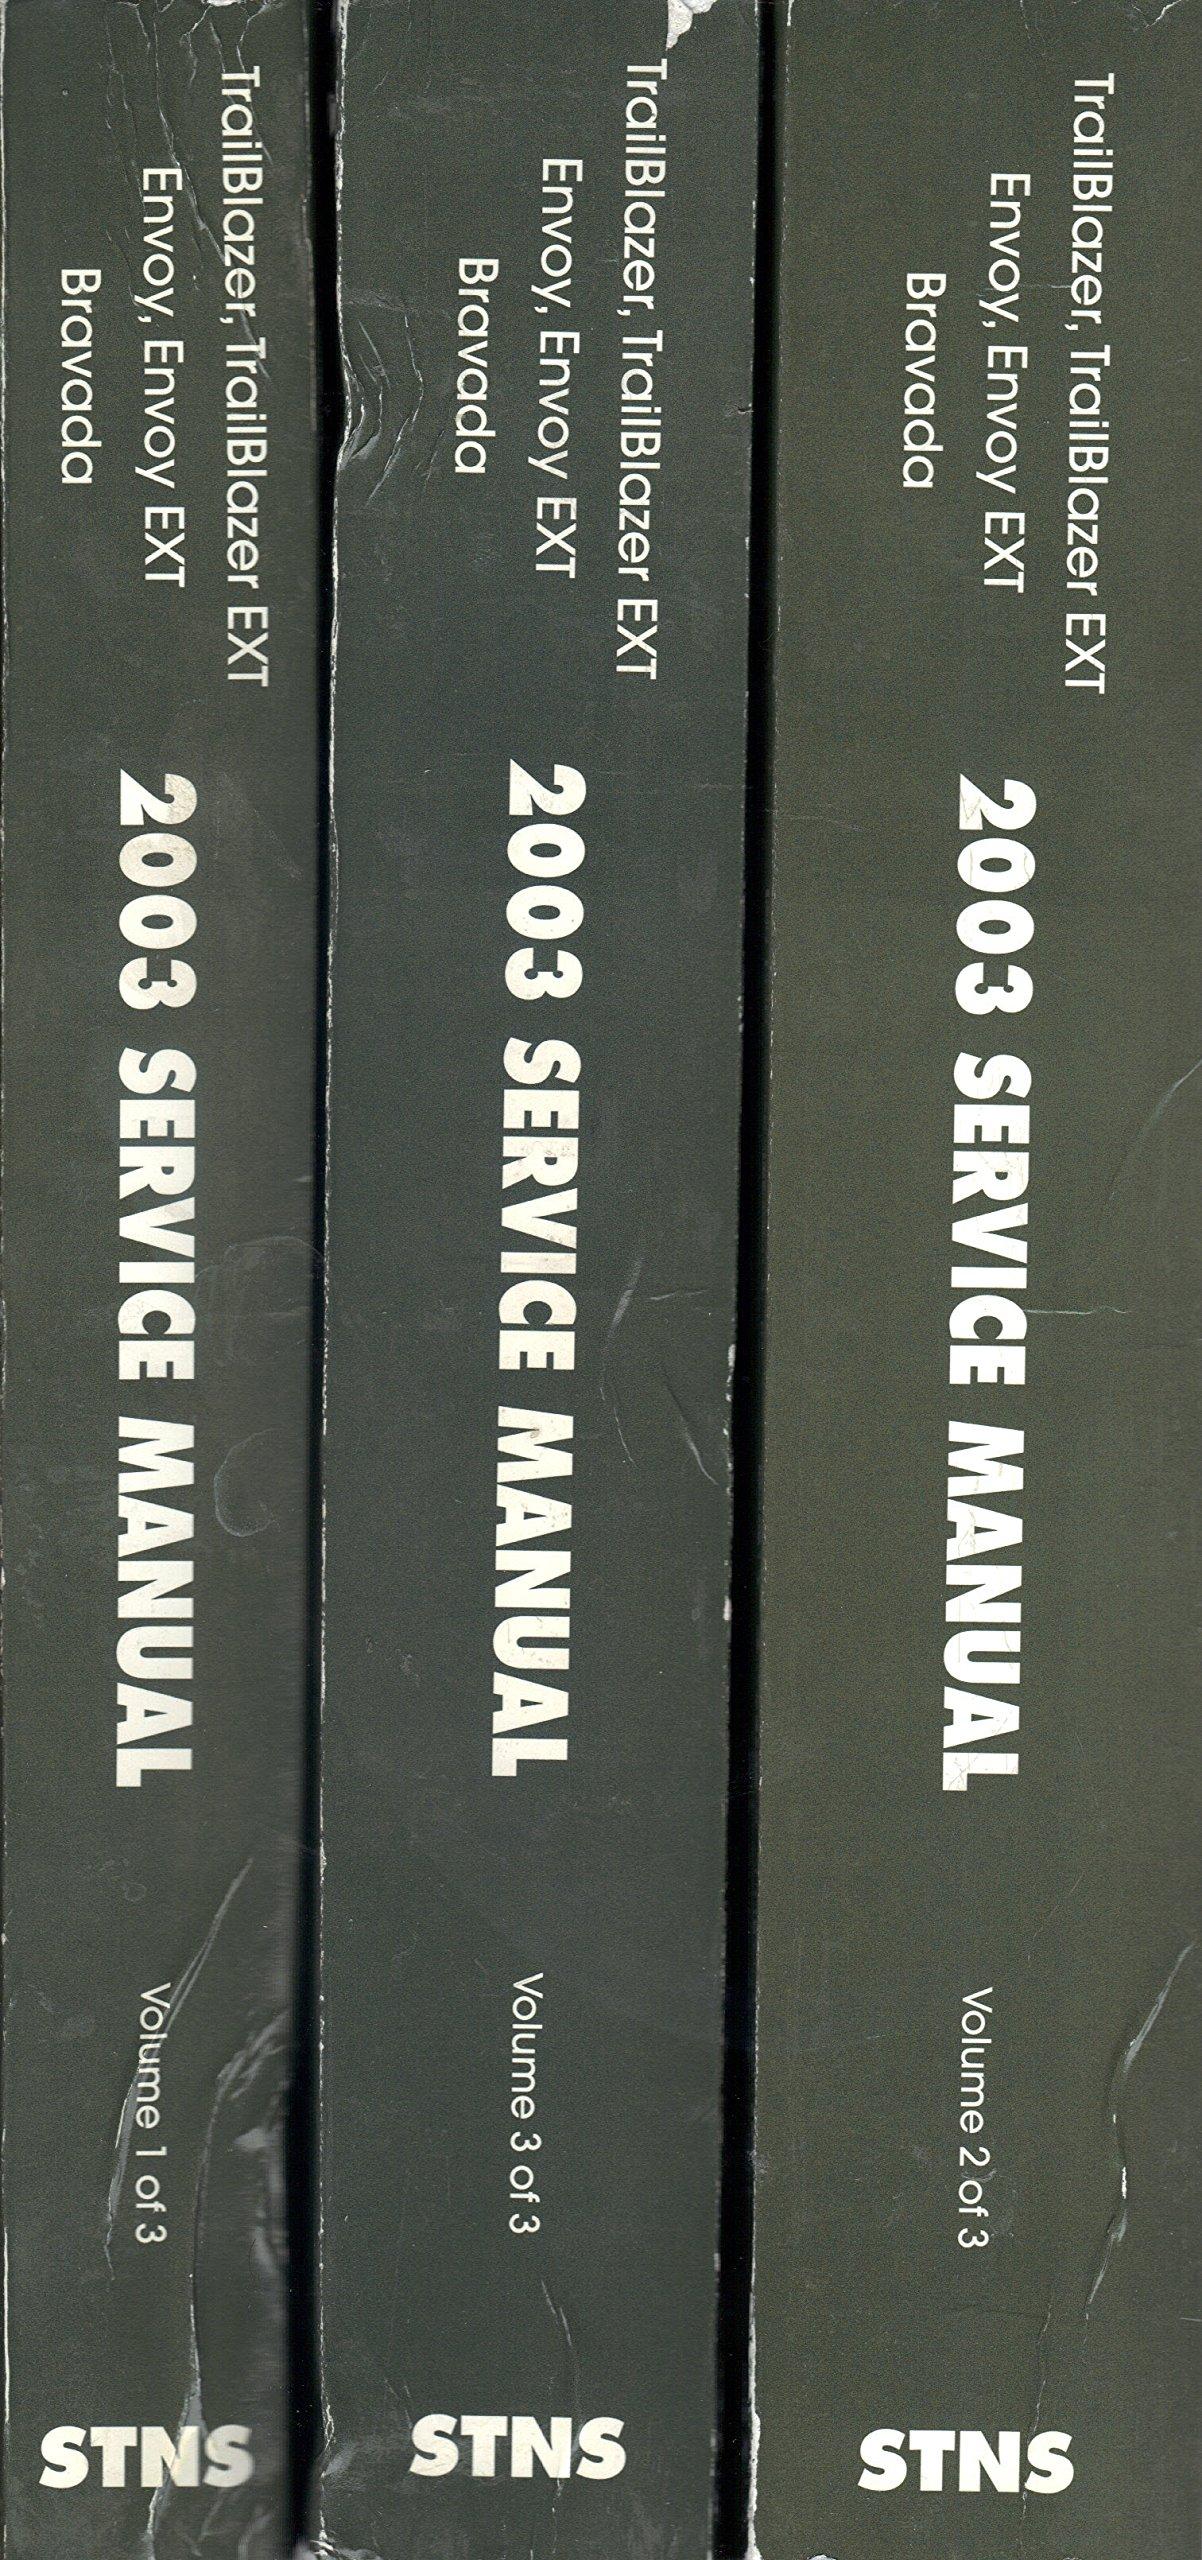 2003 Chevy Trailblazer EXT ENVOY & XL BRAVADA Service Shop Repair Manual SET  (3 volume set): gm: Amazon.com: Books